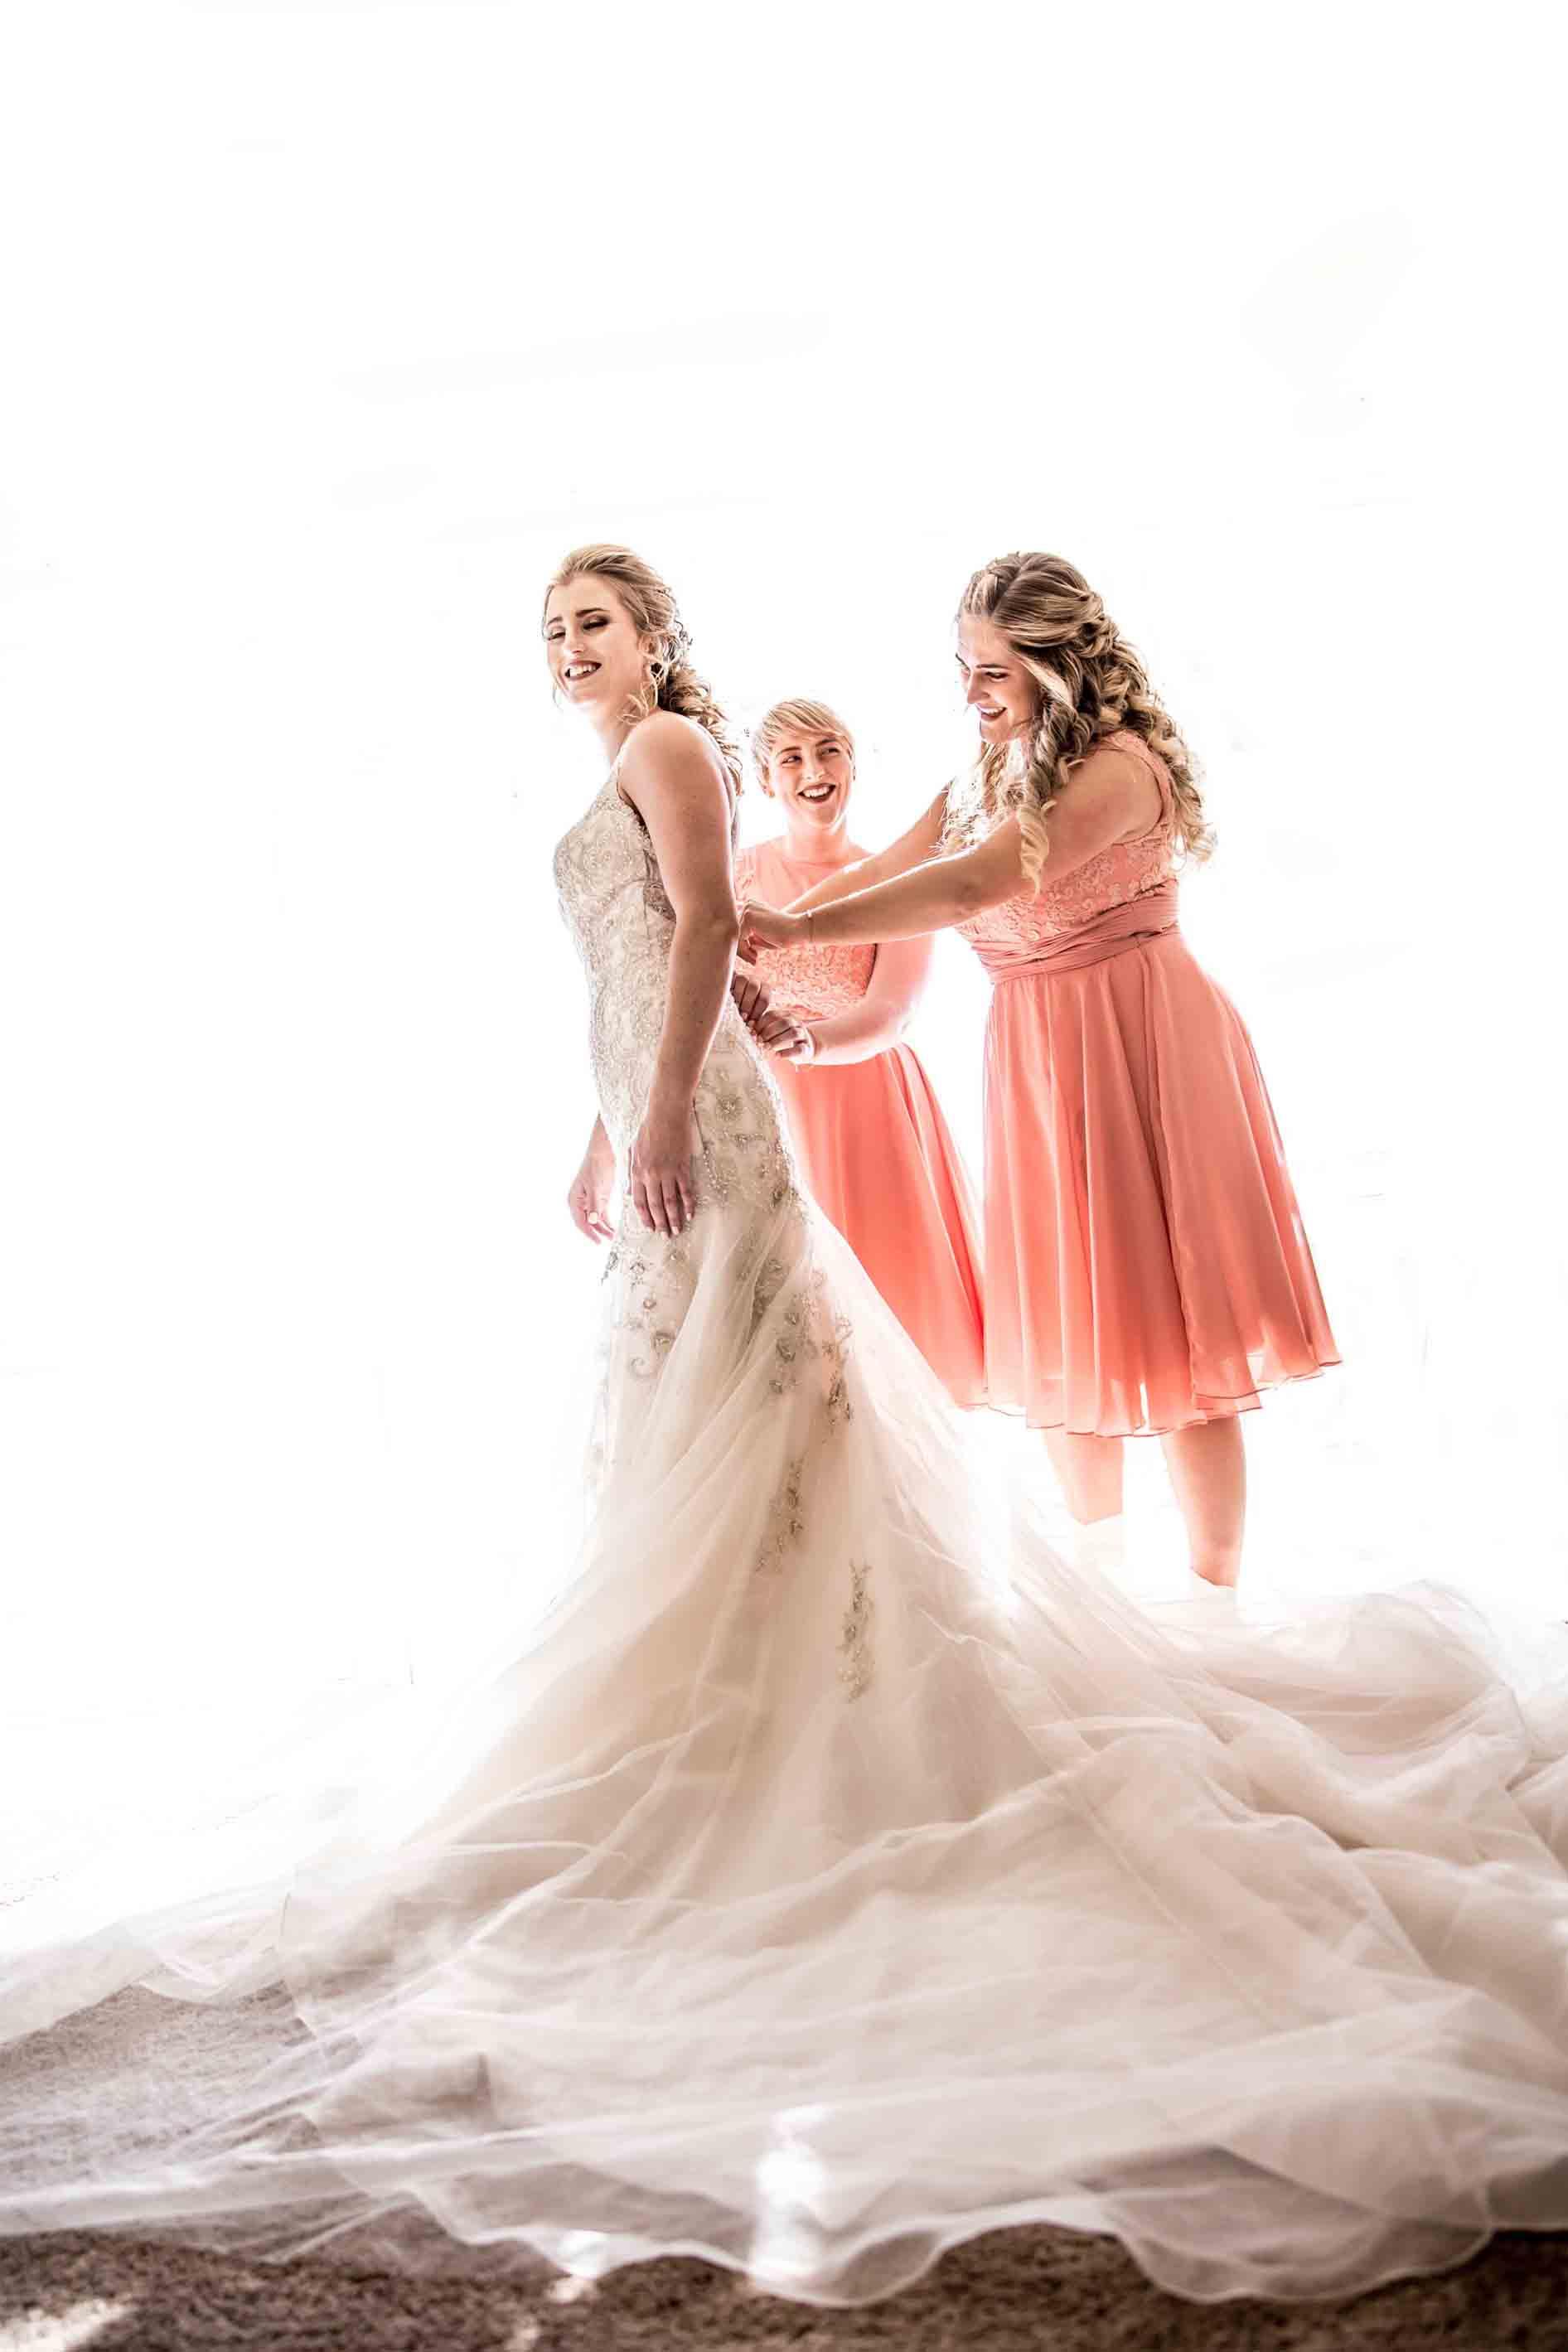 bridesmaids helping bride put on wedding dress